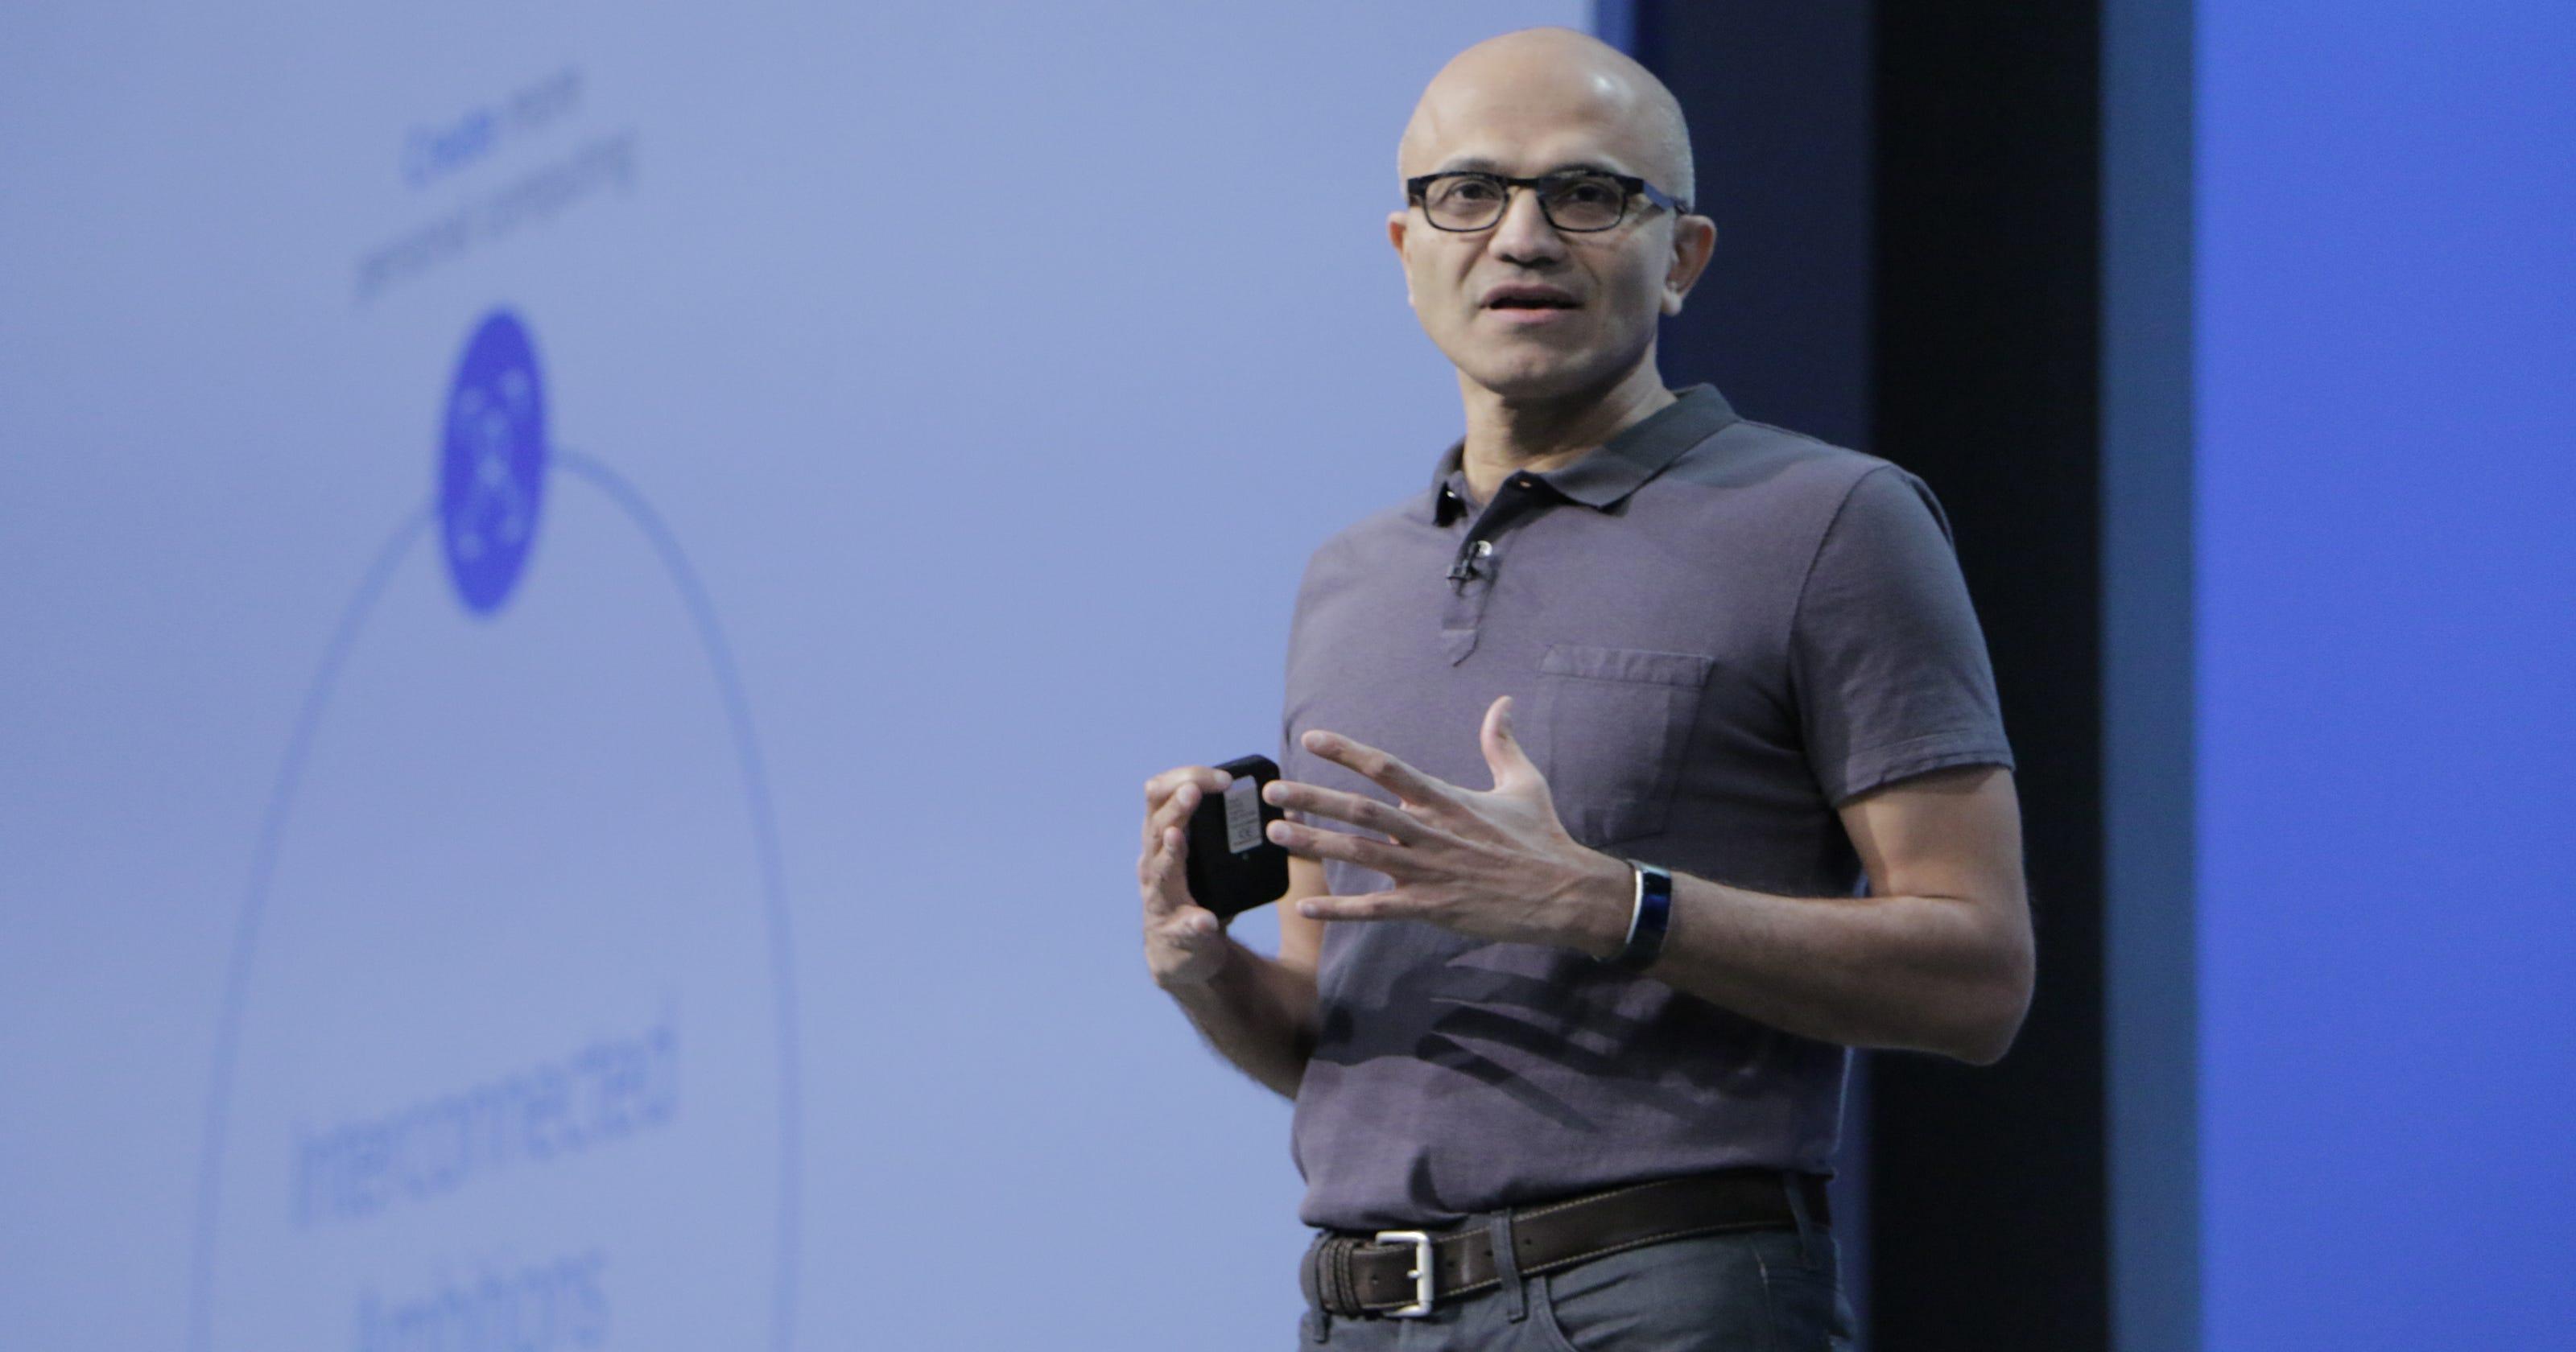 Microsoft CEO Nadella: \'Bots are the new apps\'